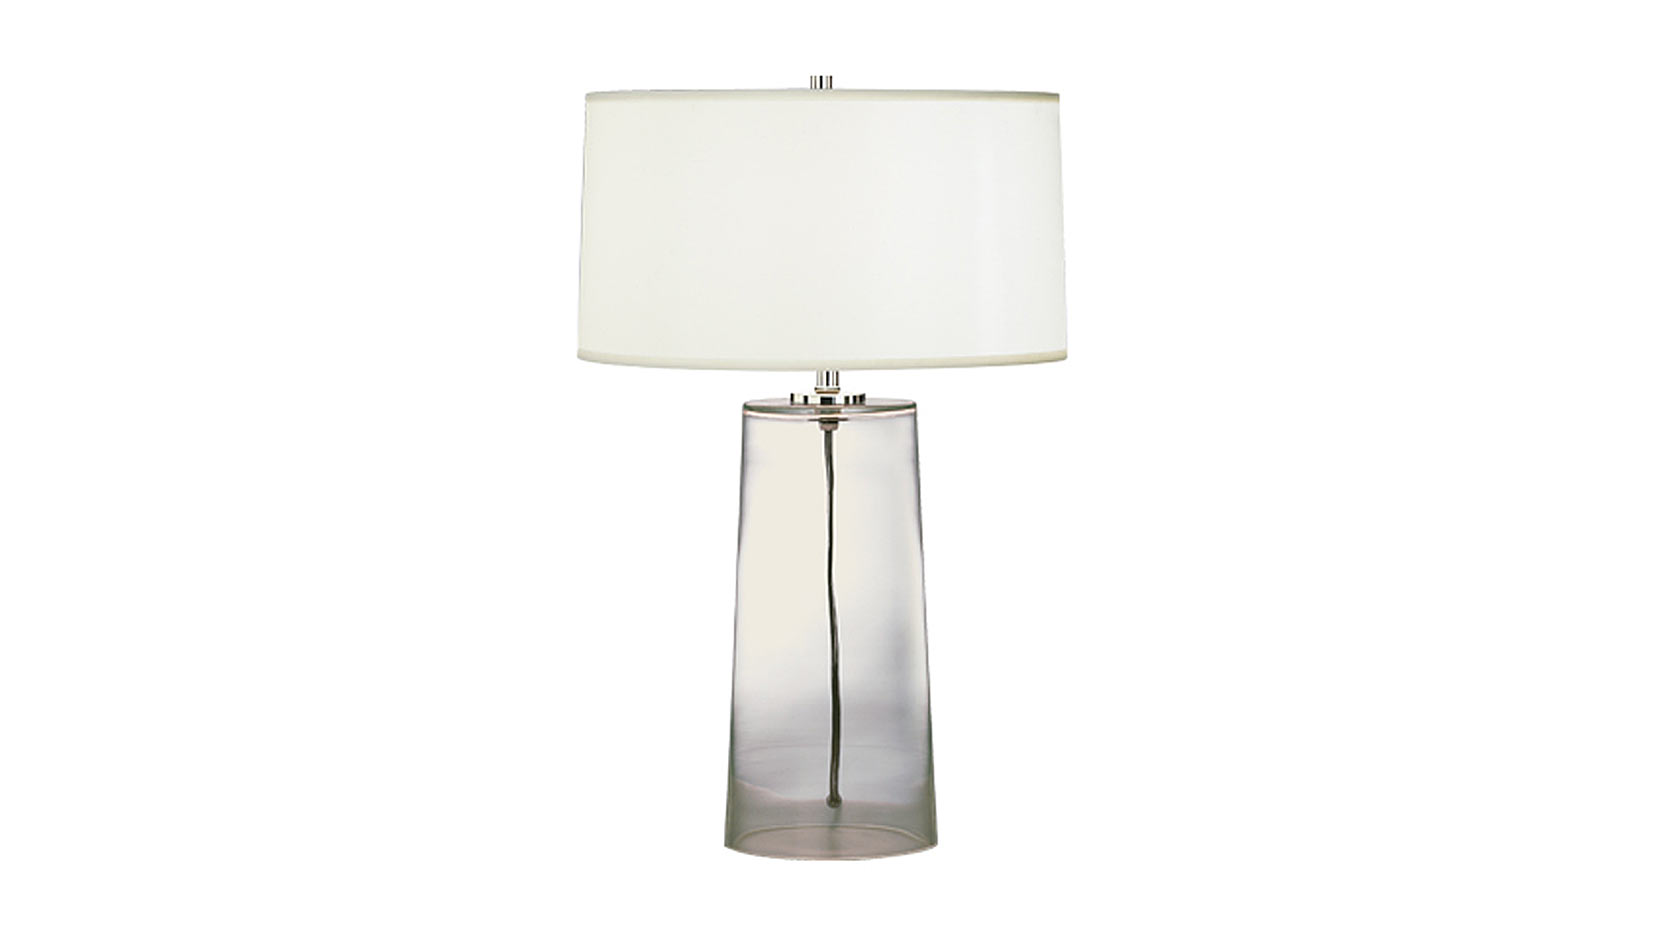 Concorde Lamp 2 (2)